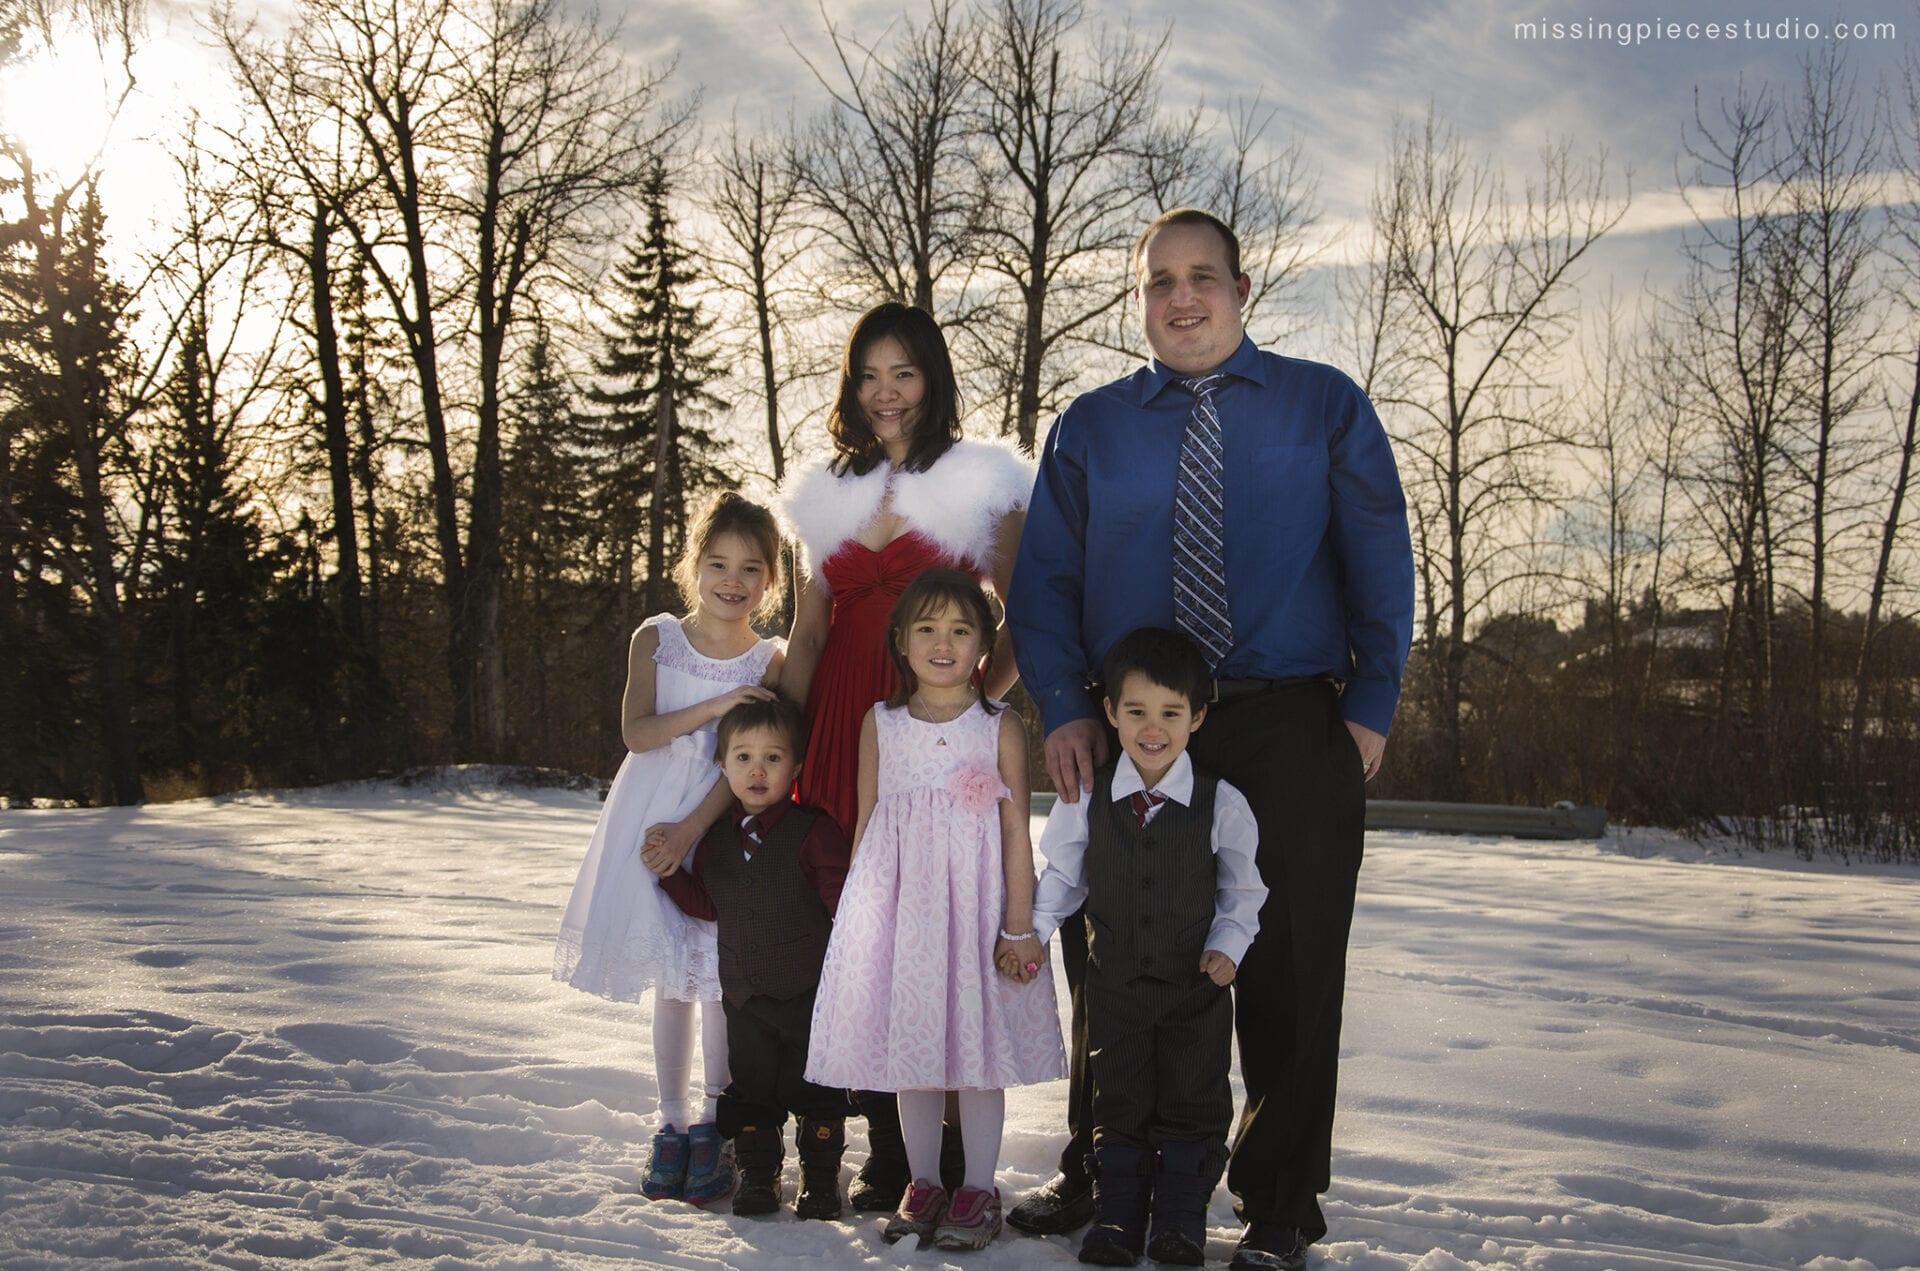 Winter family portrait session at Whitemud Park Bridge